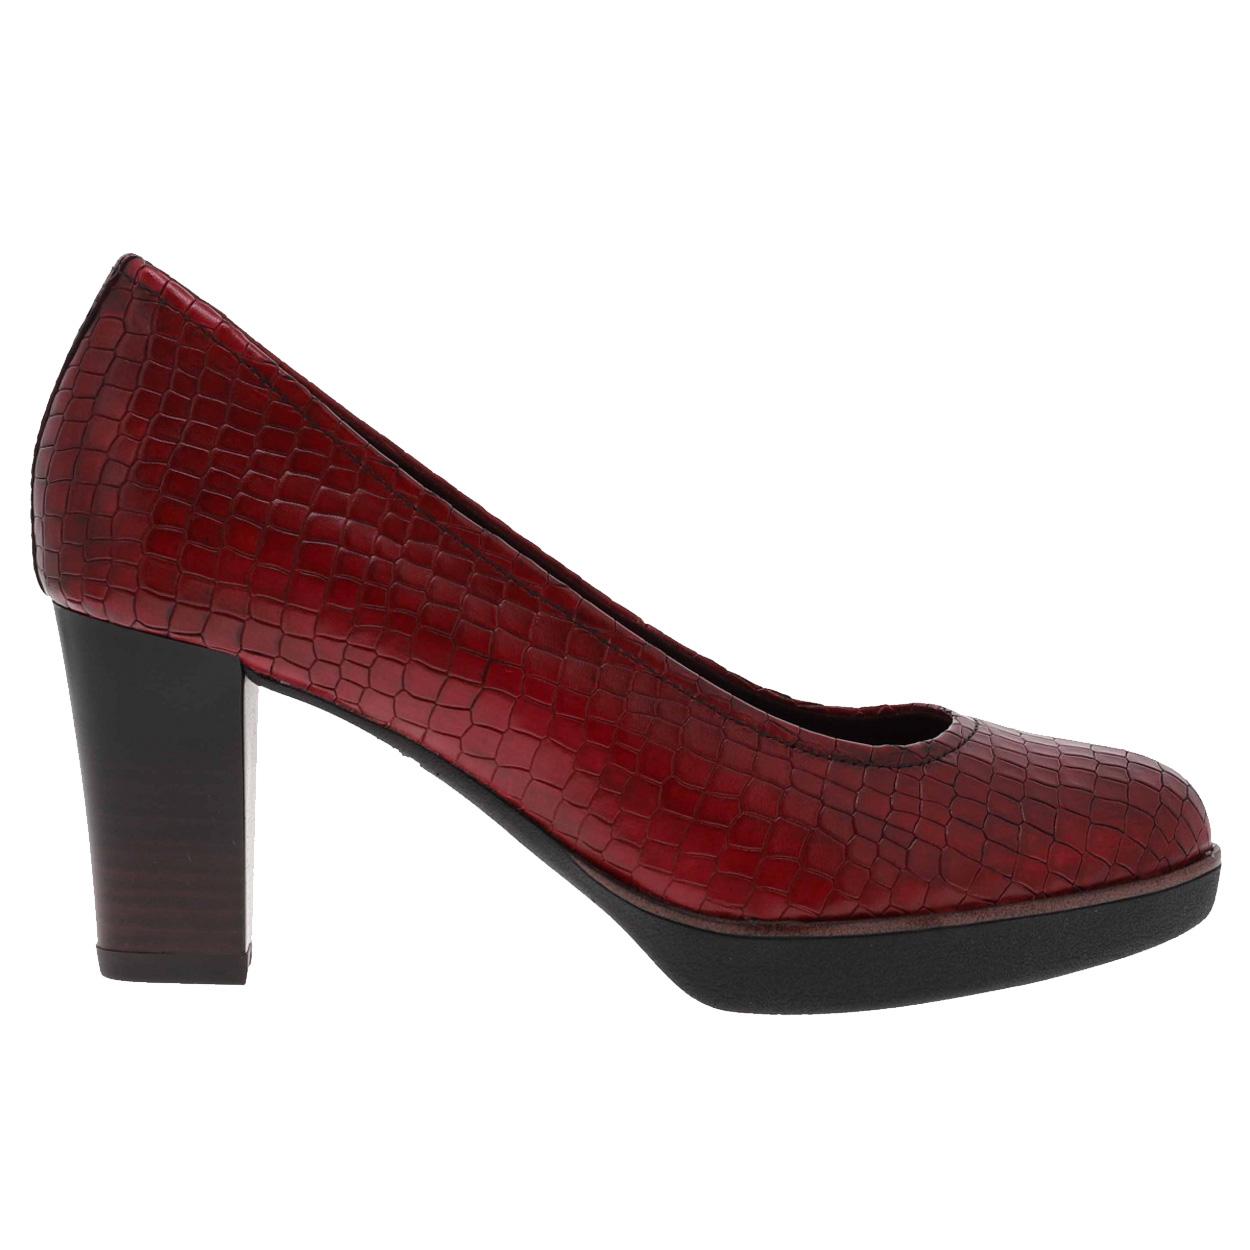 Escarpins femmes Tamaris Scarlet en cuir rouge bordeaux effet croco